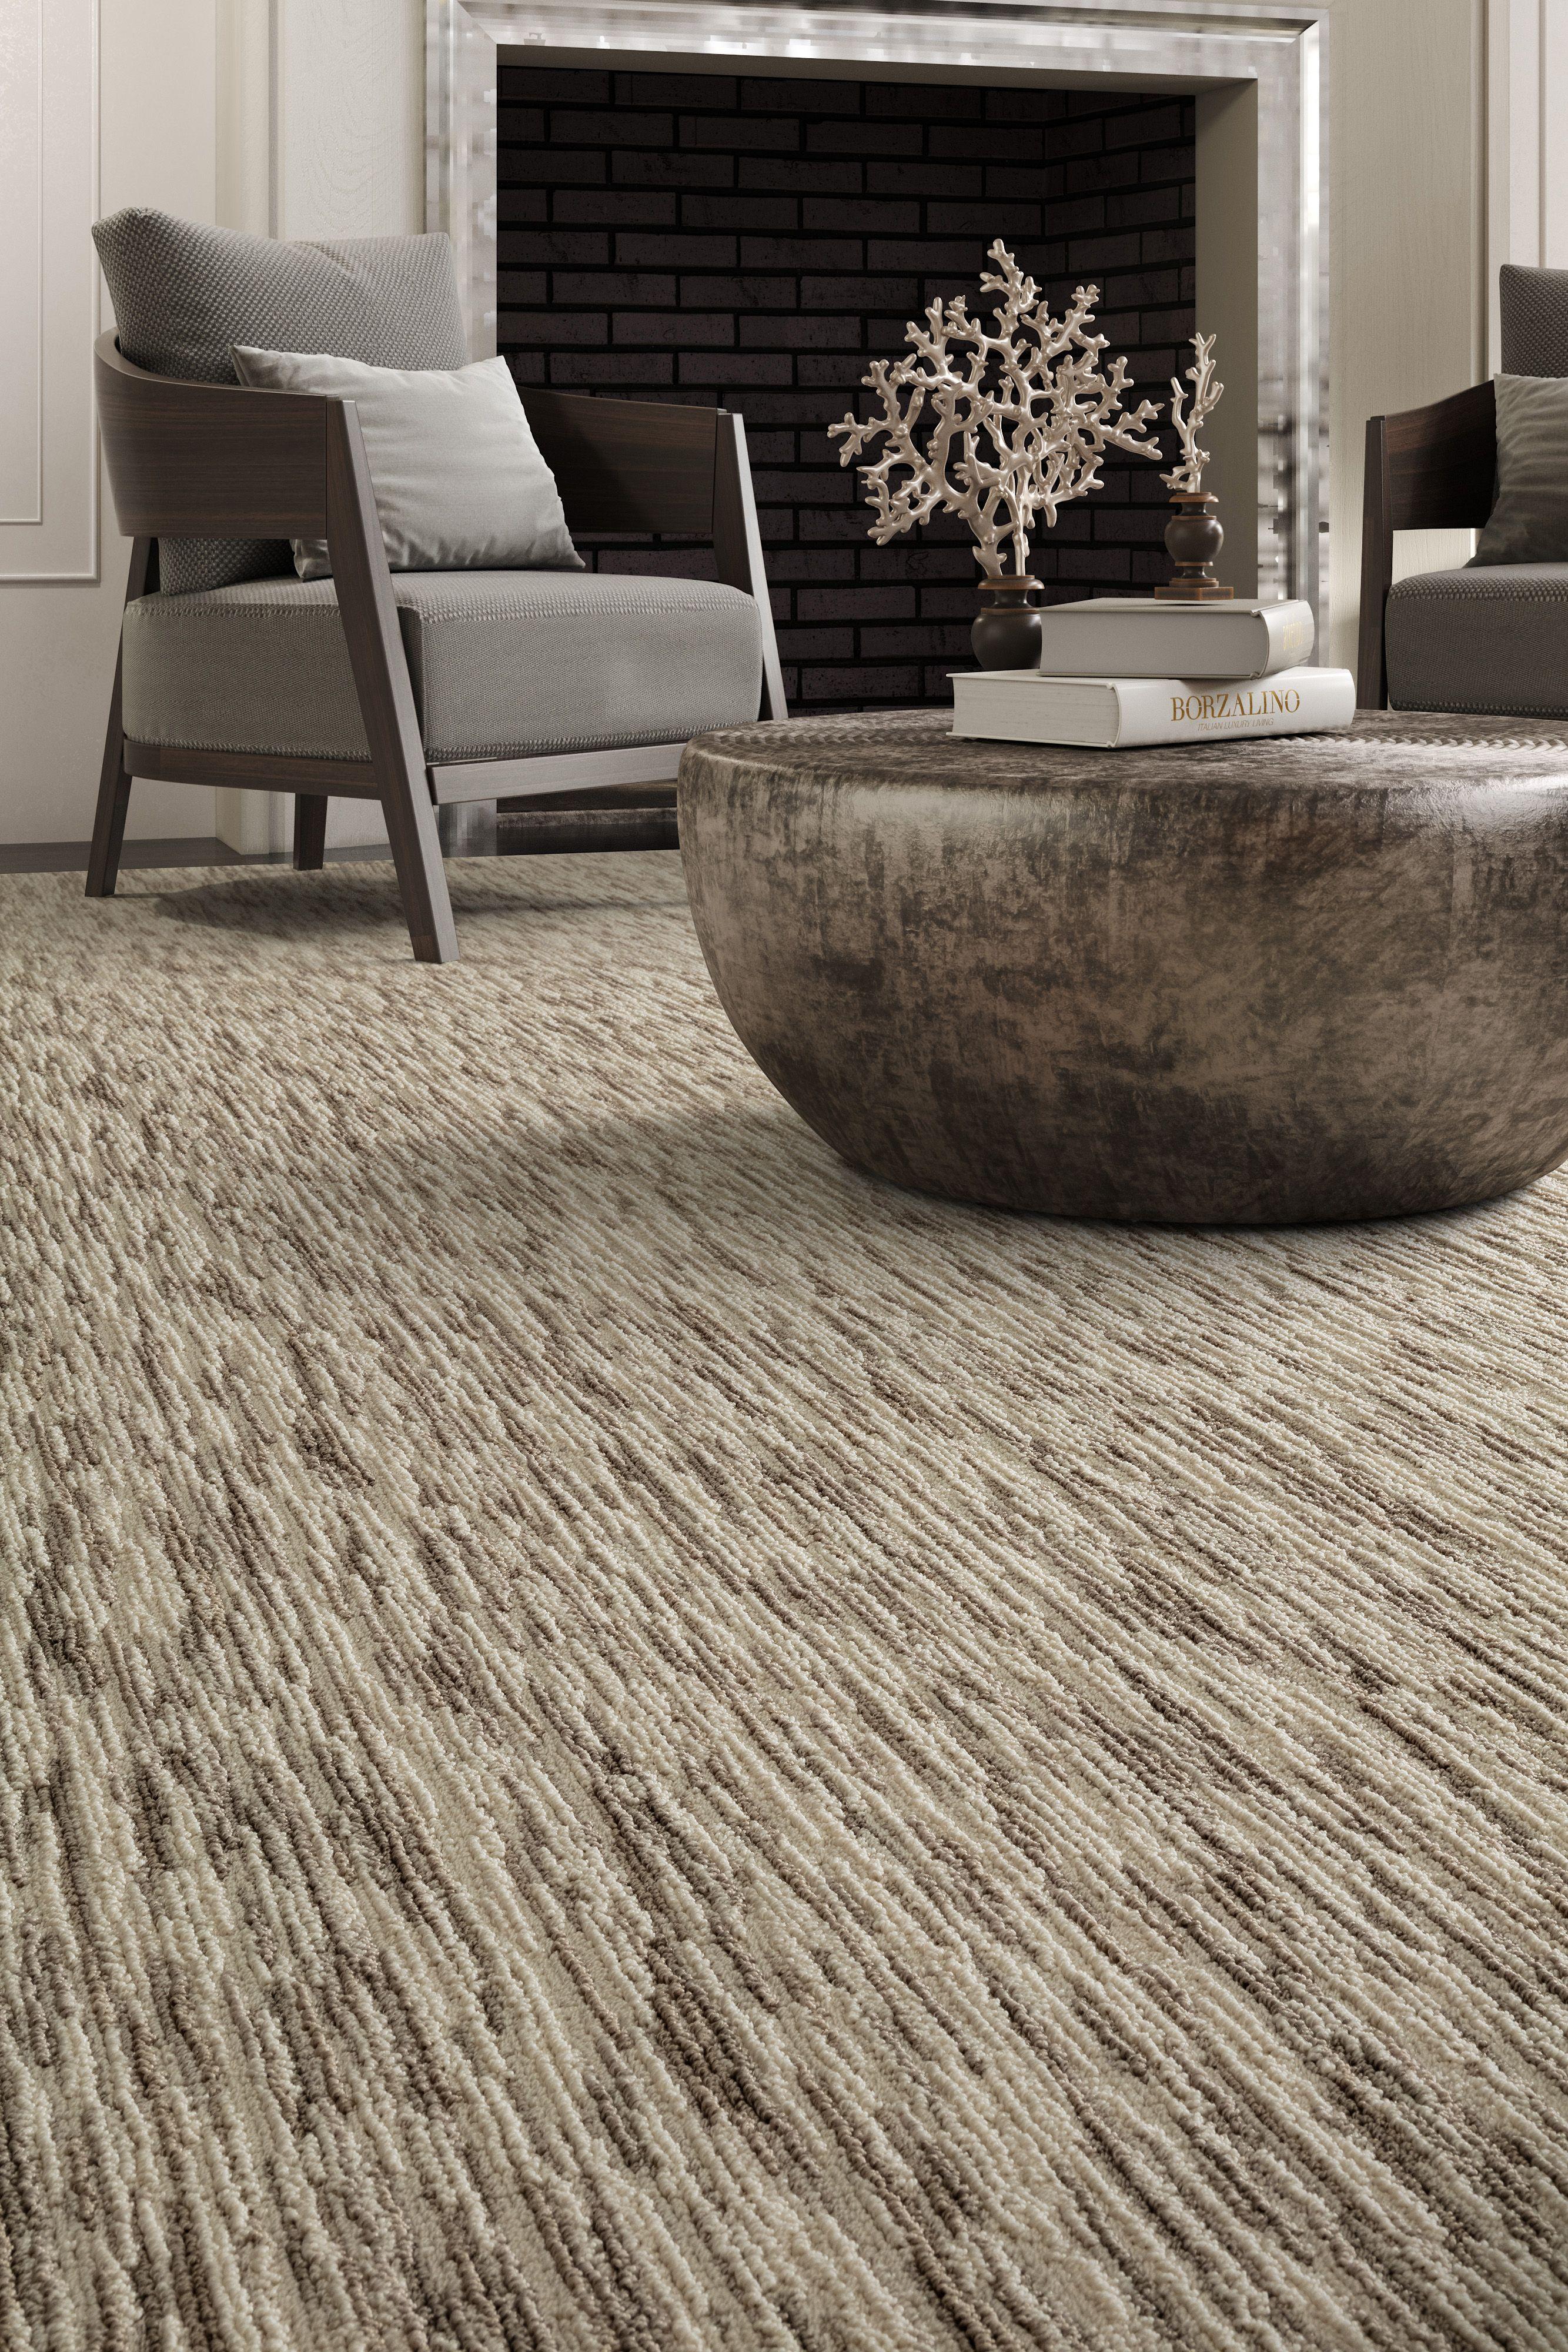 Posh Stria Home Decorators Collection Interior Hardwood Tile